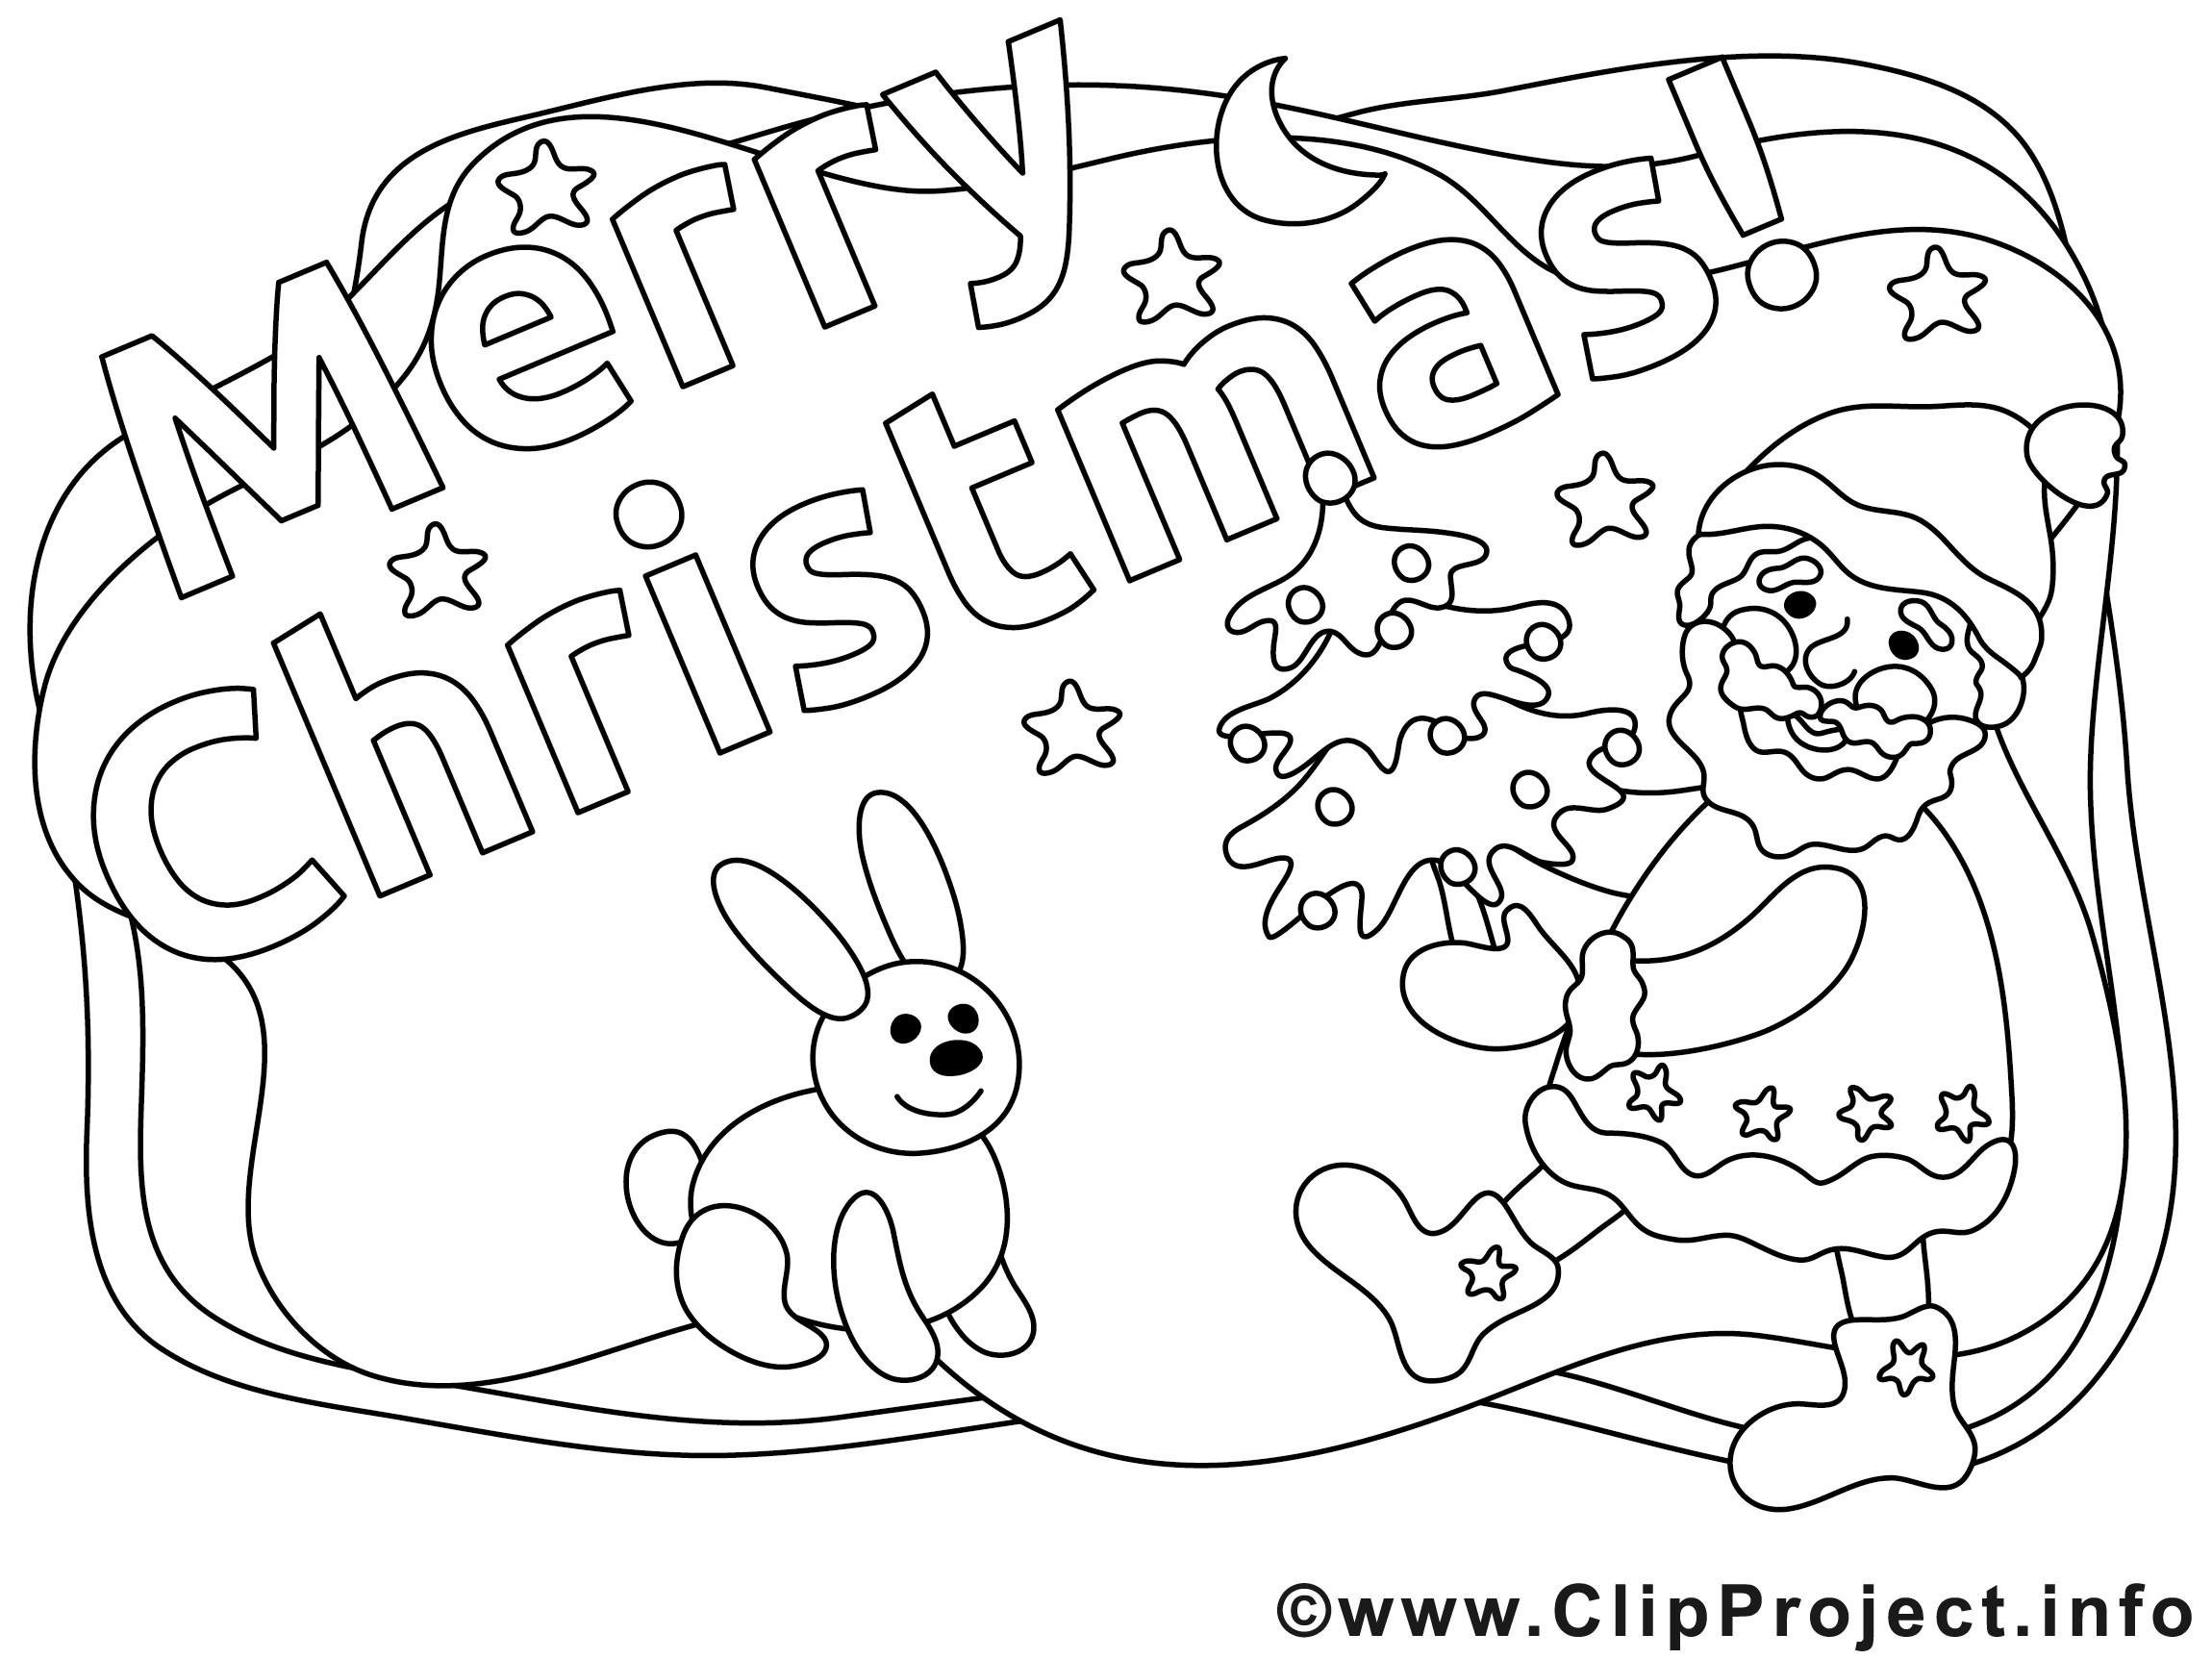 Ausmalbilder Weihnachten Merry Christmas Neu Ausmalbilder Weihnachten Pinguin Malvorlagen Innen De Bild